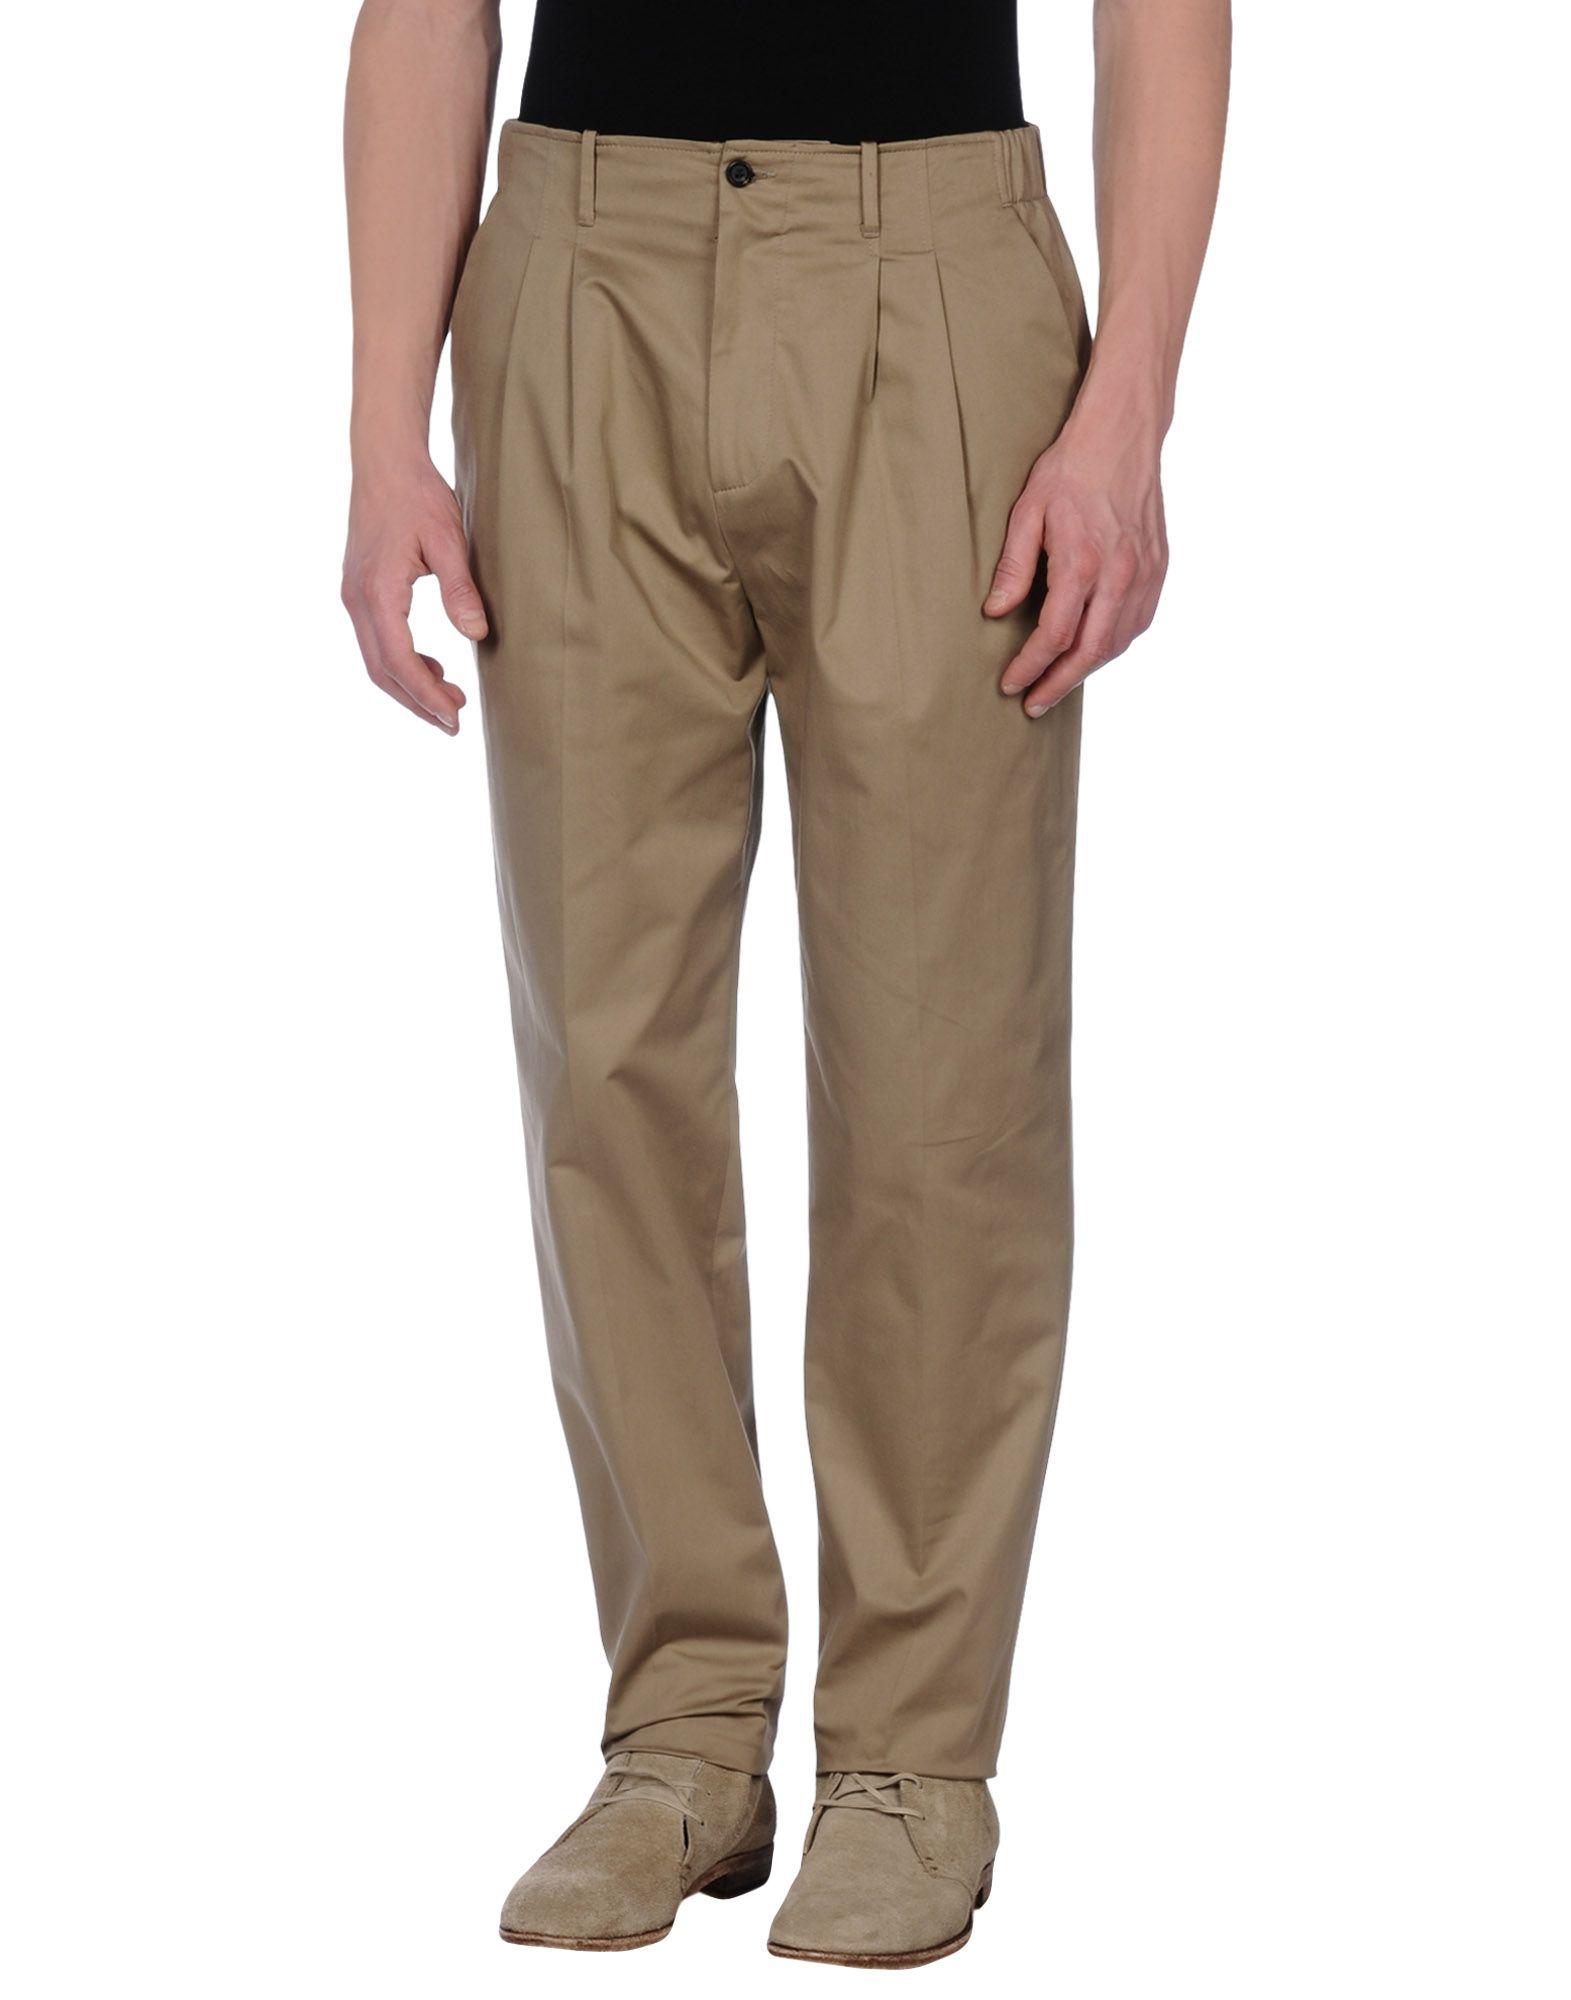 GIULIANO FUJIWARA Casual Pants in Dove Grey